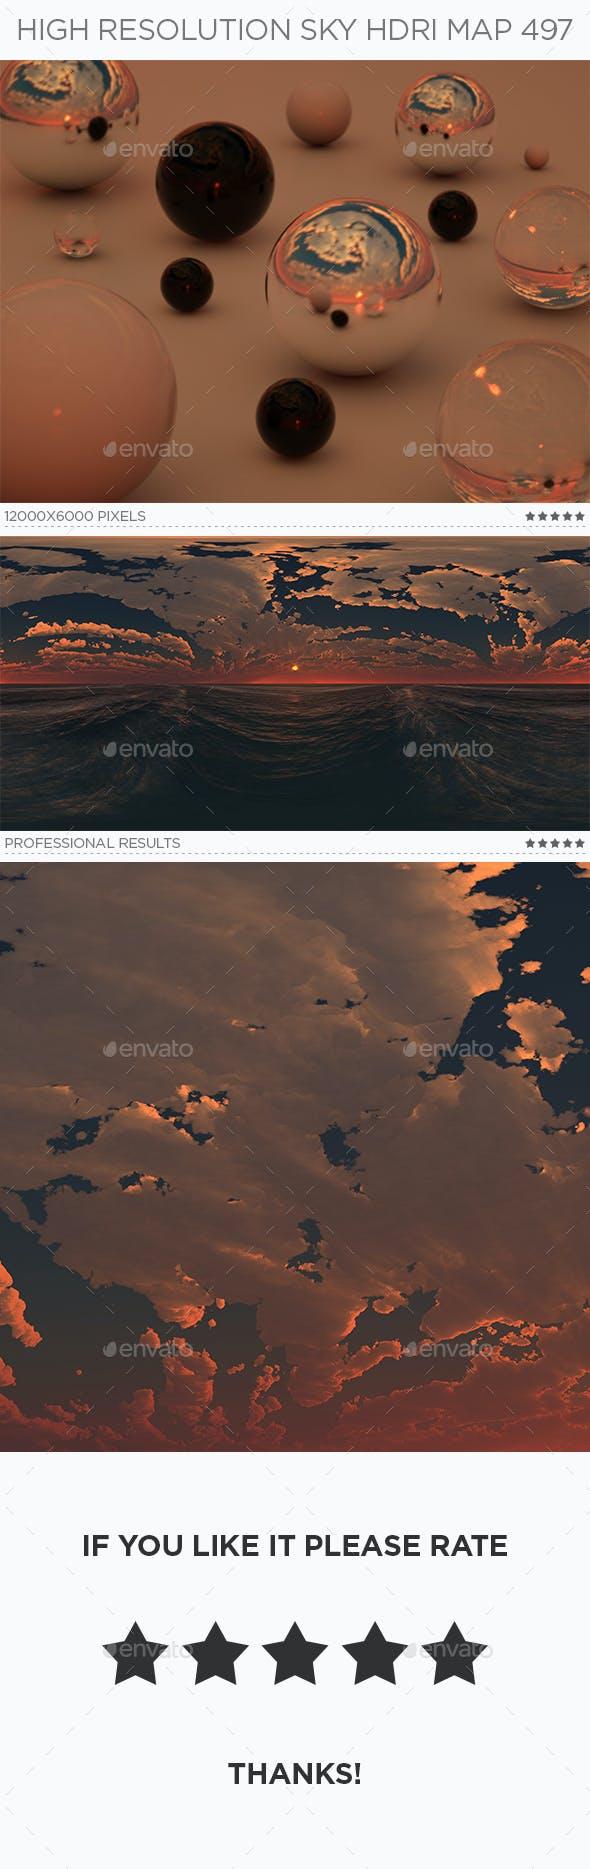 High Resolution Sky HDRi Map 497 - 3DOcean Item for Sale